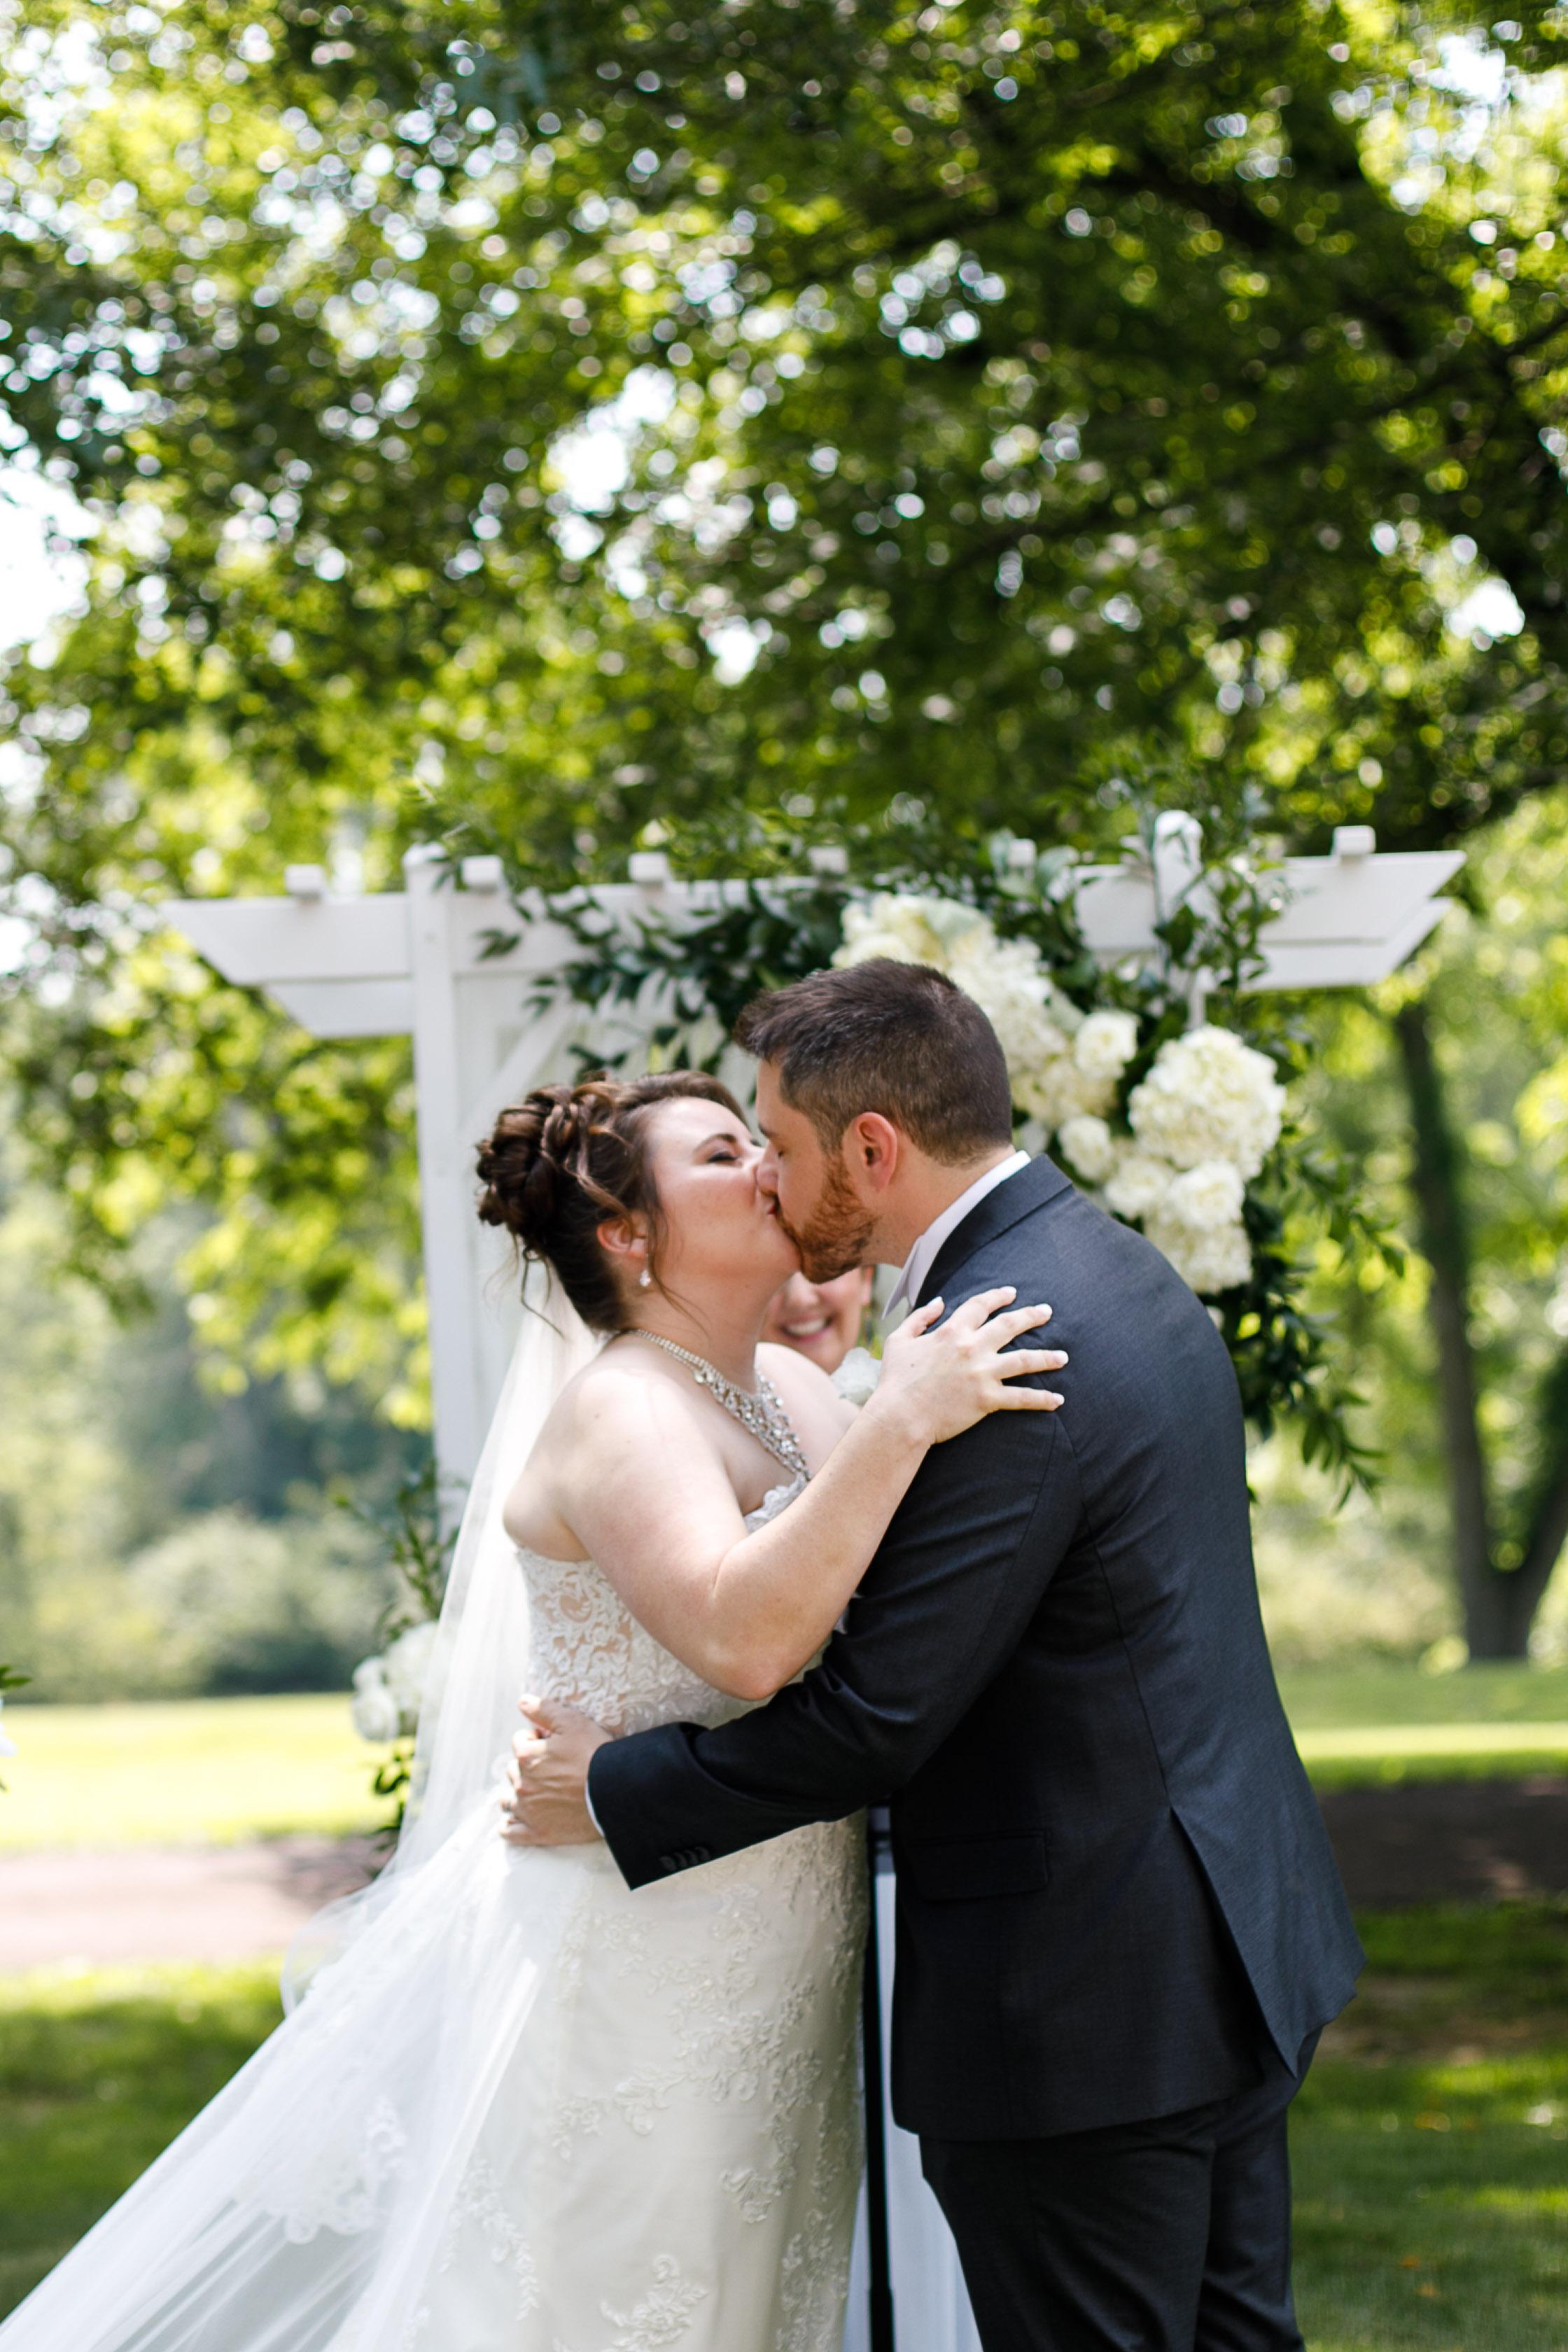 Wedding at Joseph Ambler In Bucks County PA33.jpg